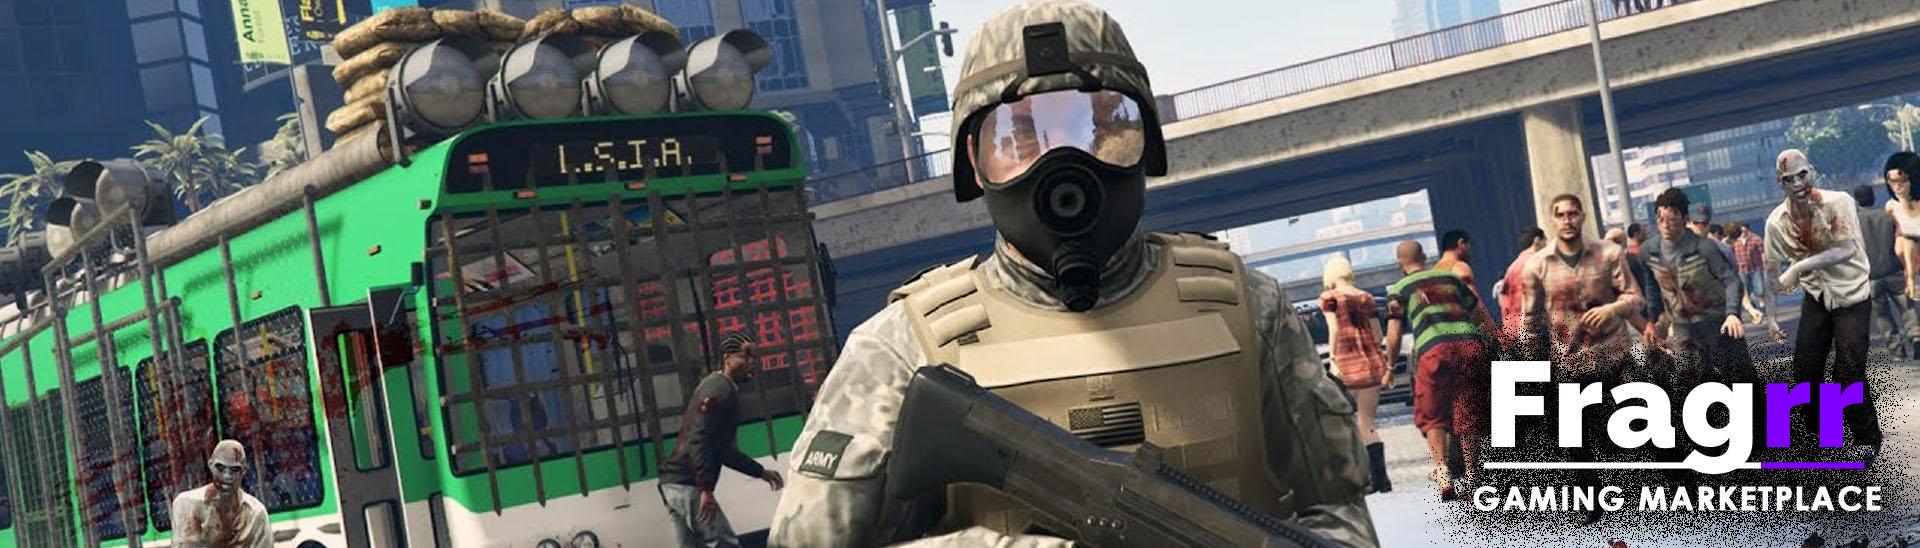 GTA 5 Mods for Sale | Fragrr